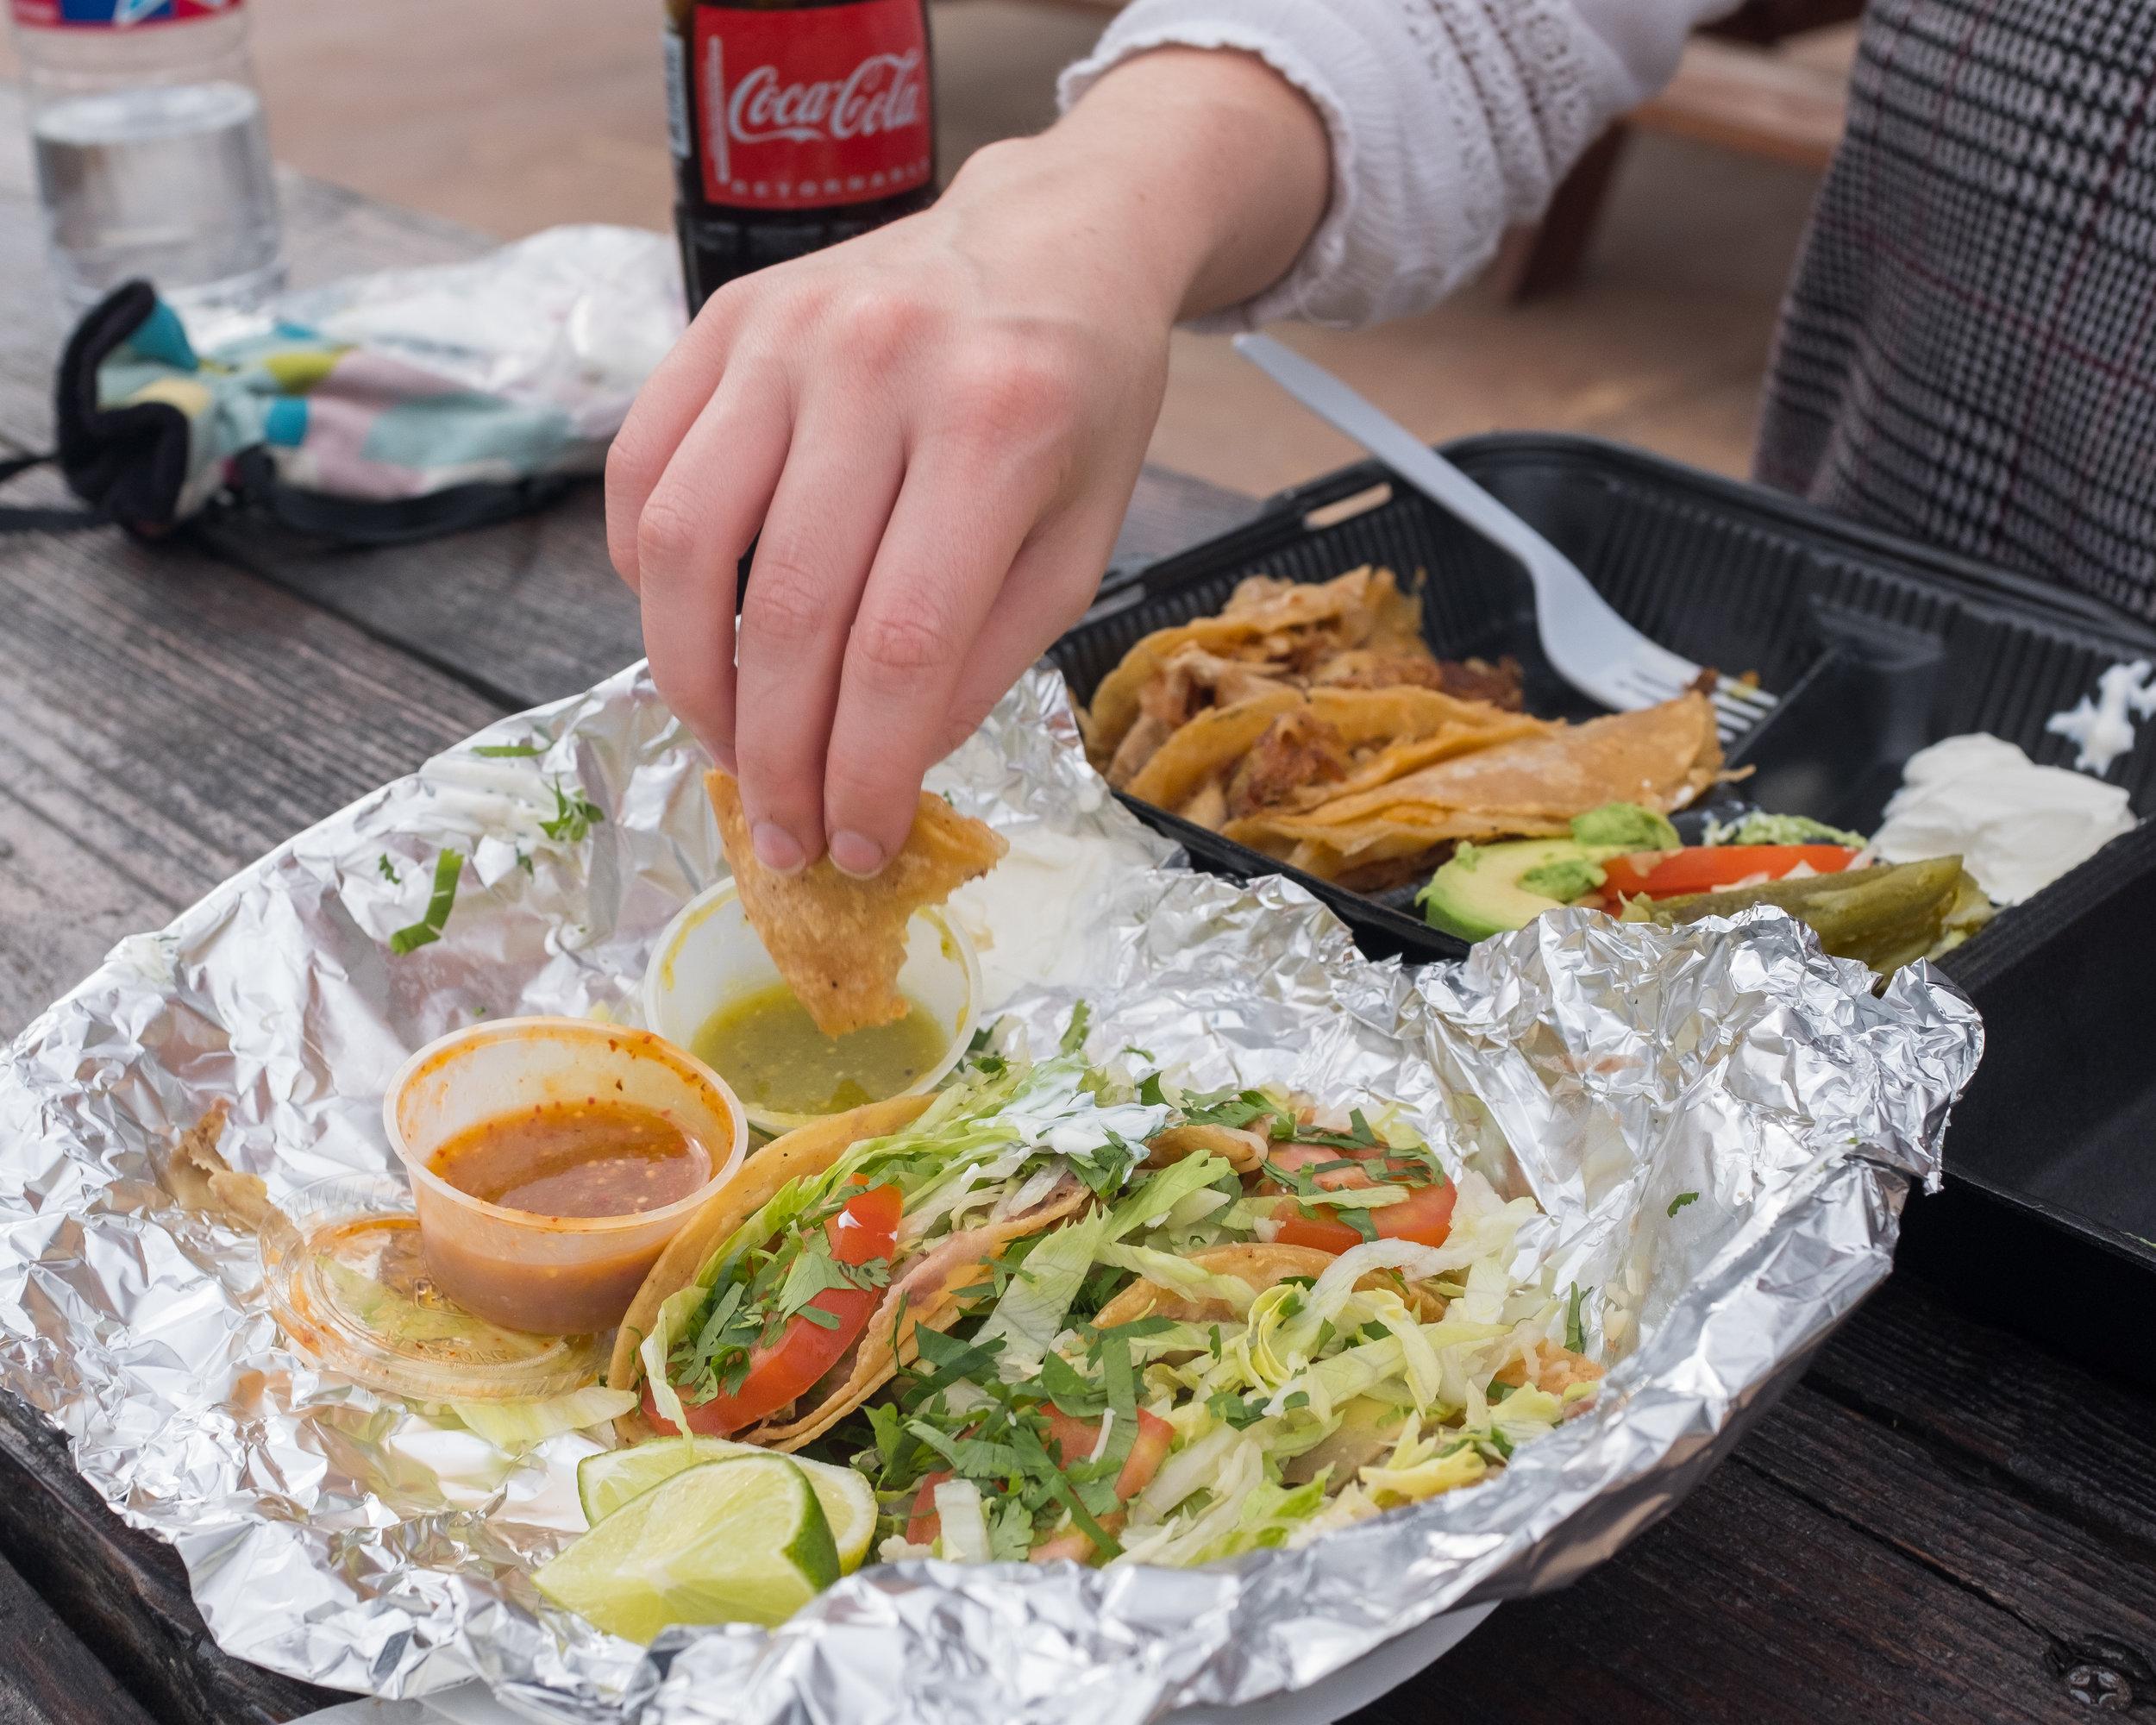 Vegetarian street tacos and a chicken quesadilla from Las Trancas